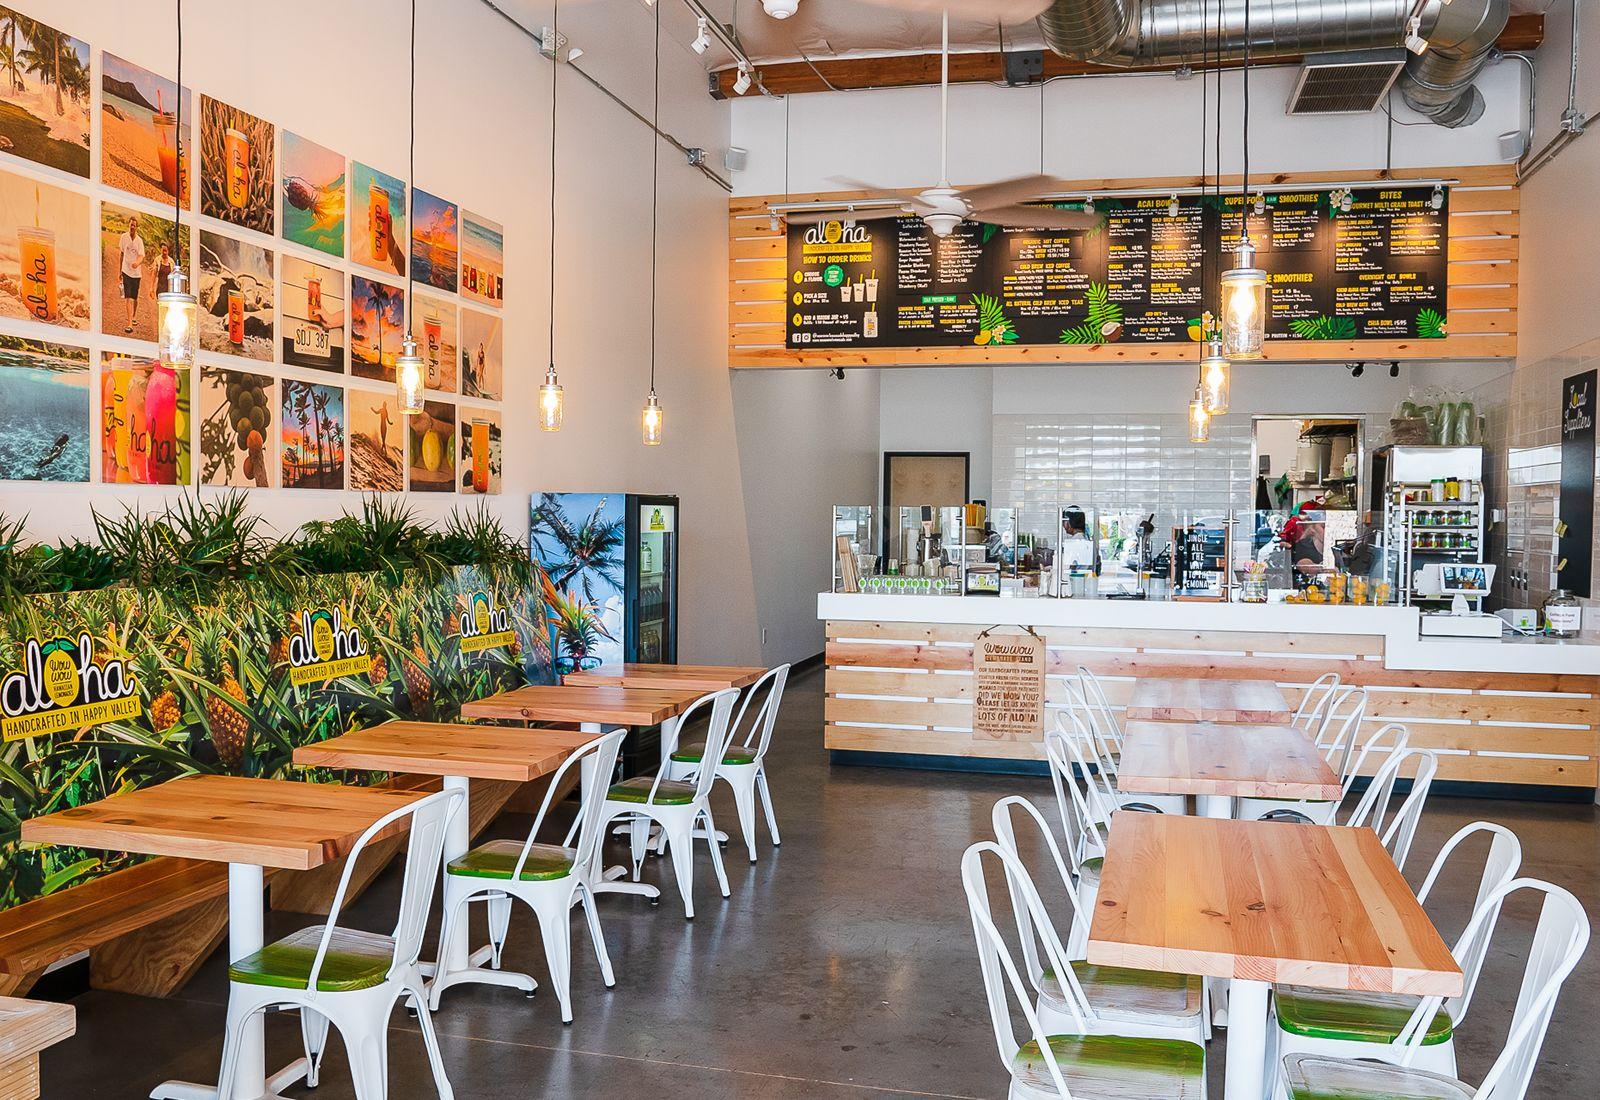 Wow Wow Hawaiian Lemonade ouvrira son premier magasin dans l'État du Texas